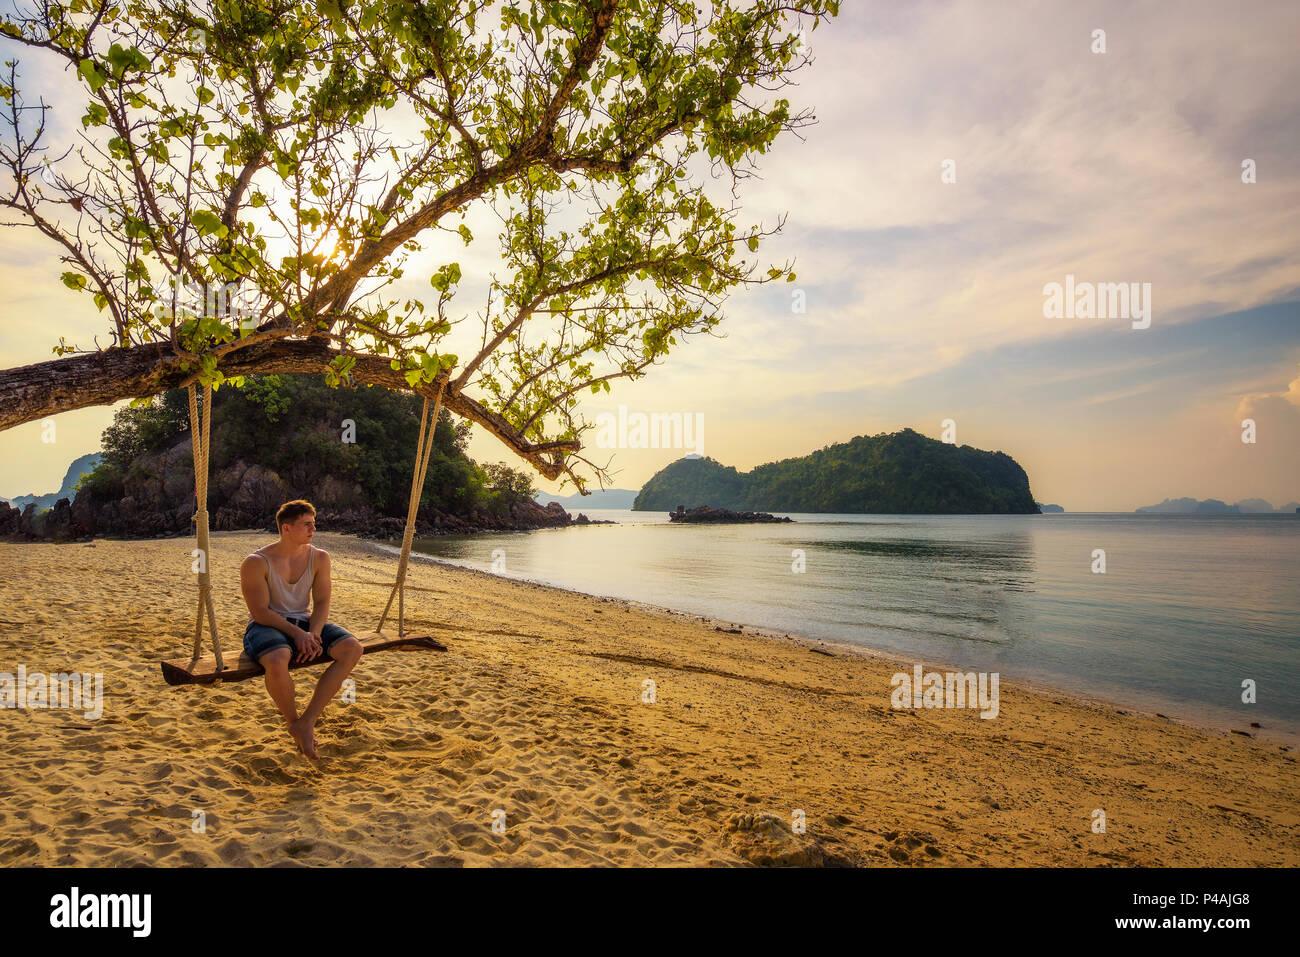 Ragazzo giovane gode di tramonto n Ko Hong Island in Thailandia Immagini Stock